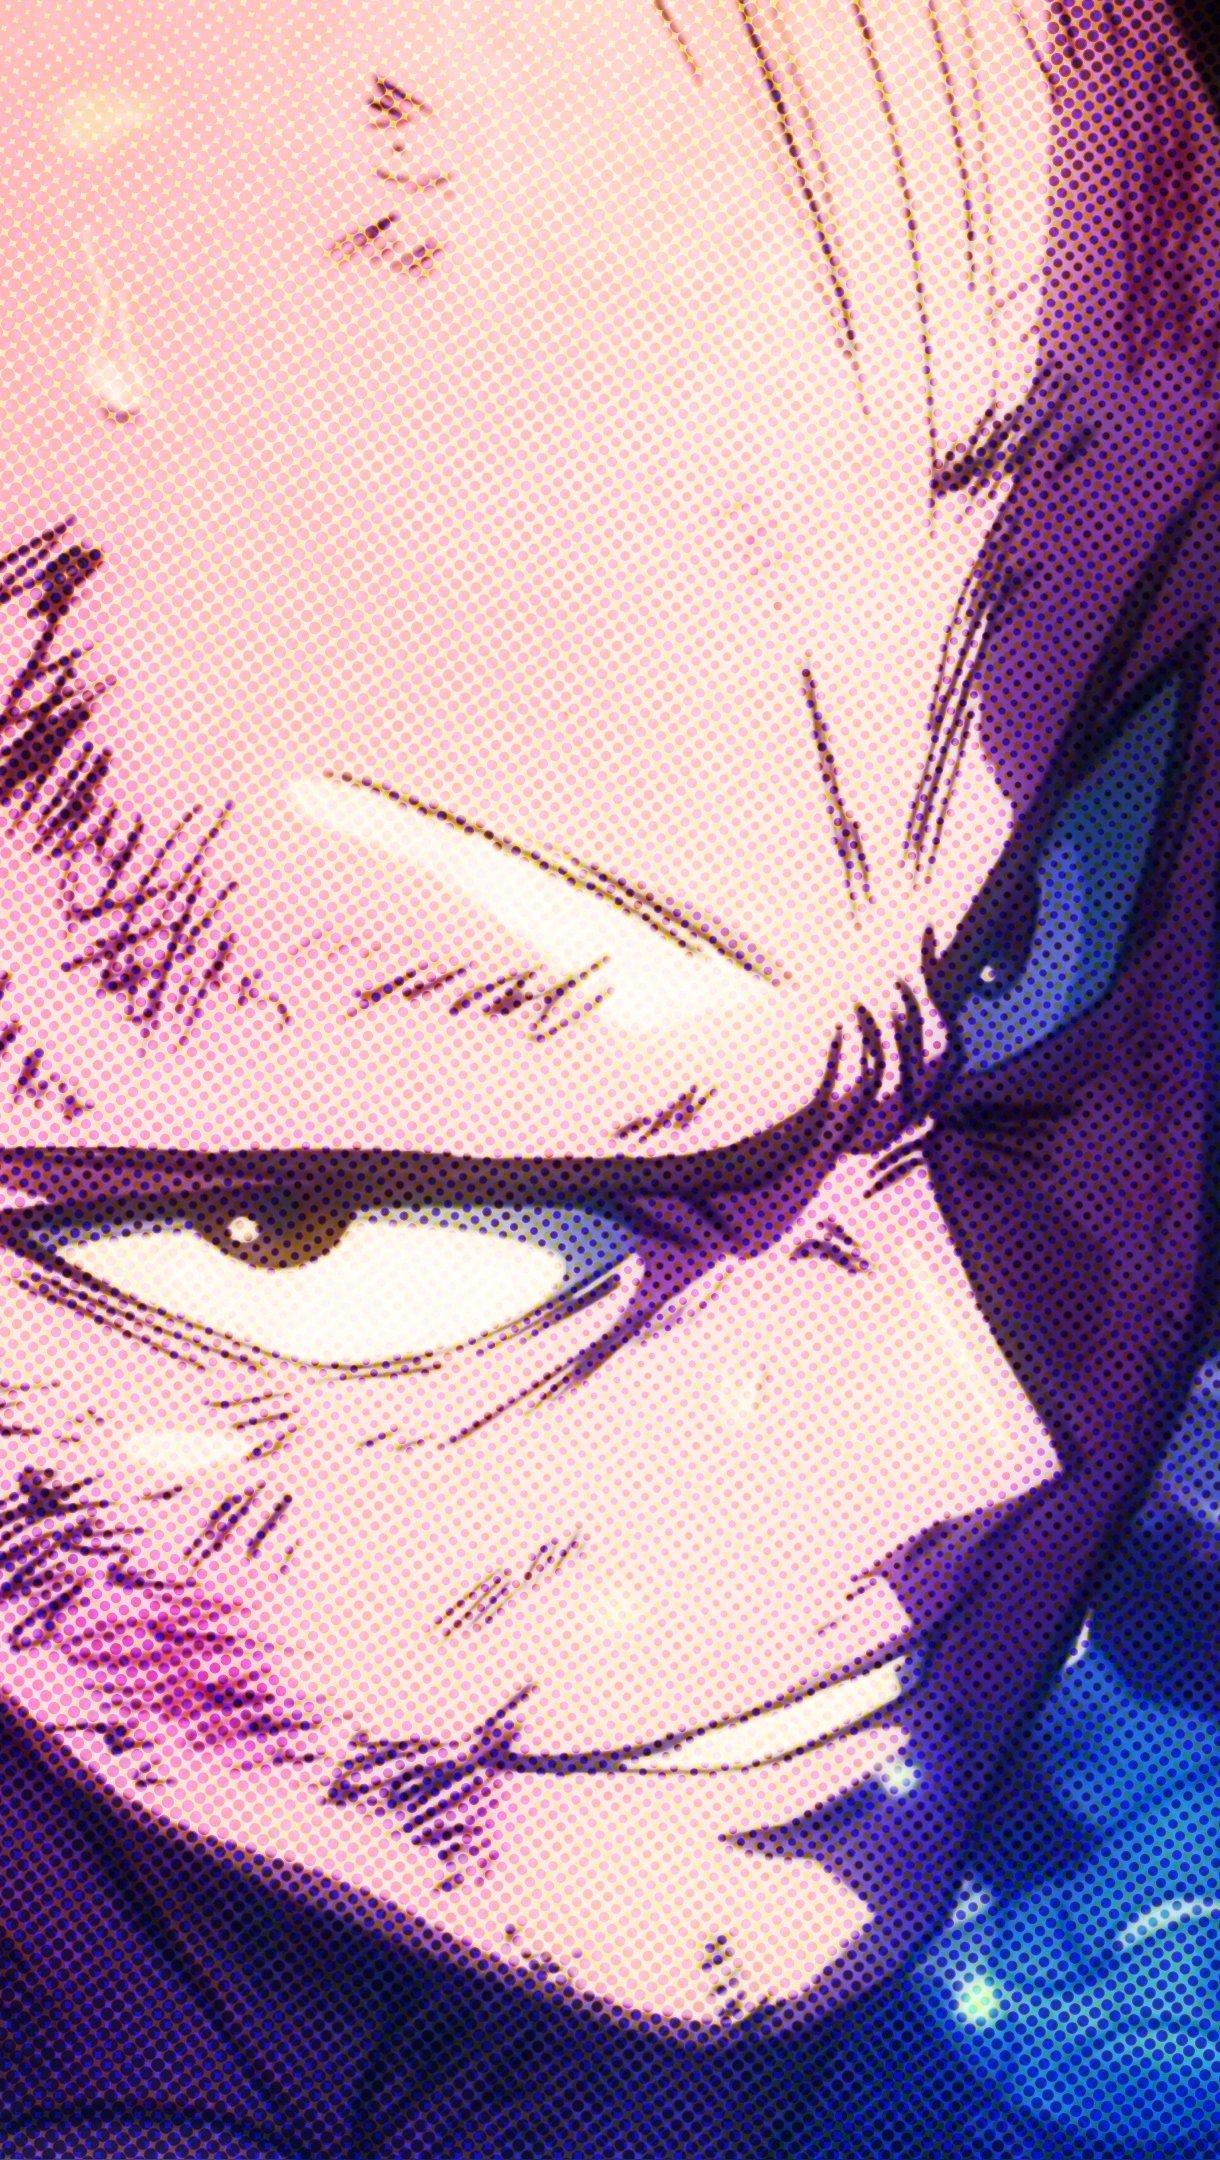 Anime Wallpaper Saitama One Punch Man Vertical